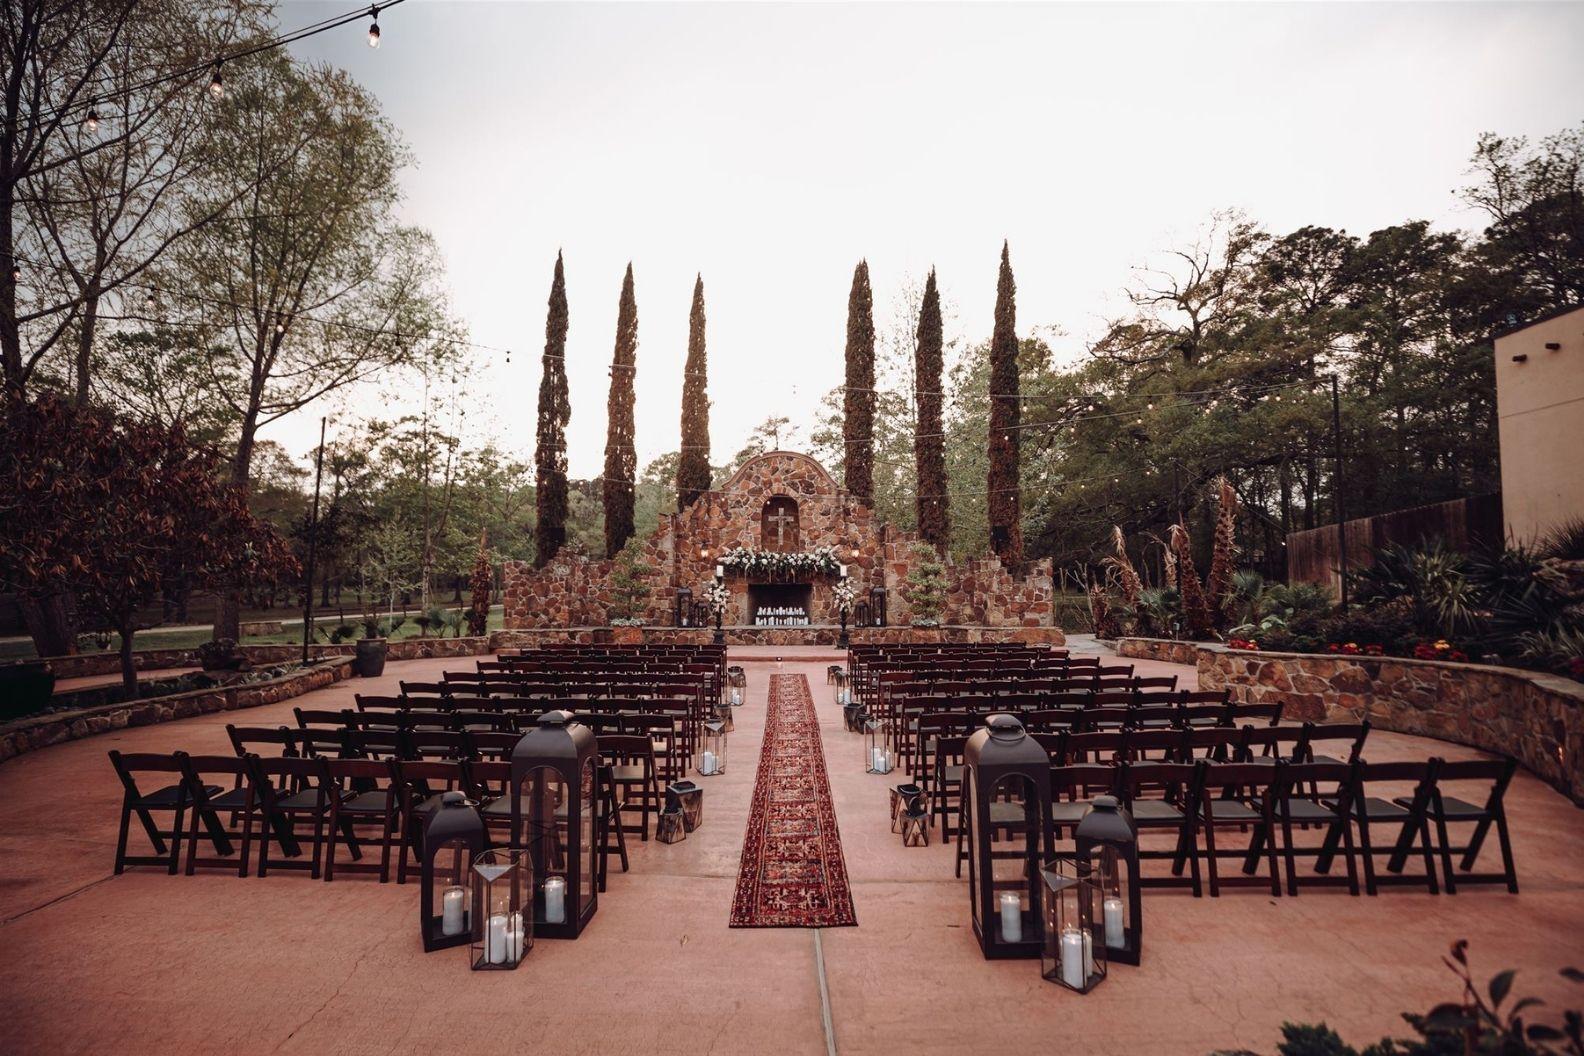 10 Samantha and Mario - Madera Estates Conroe Texas - Twilight Evening Outdoor Ceremony